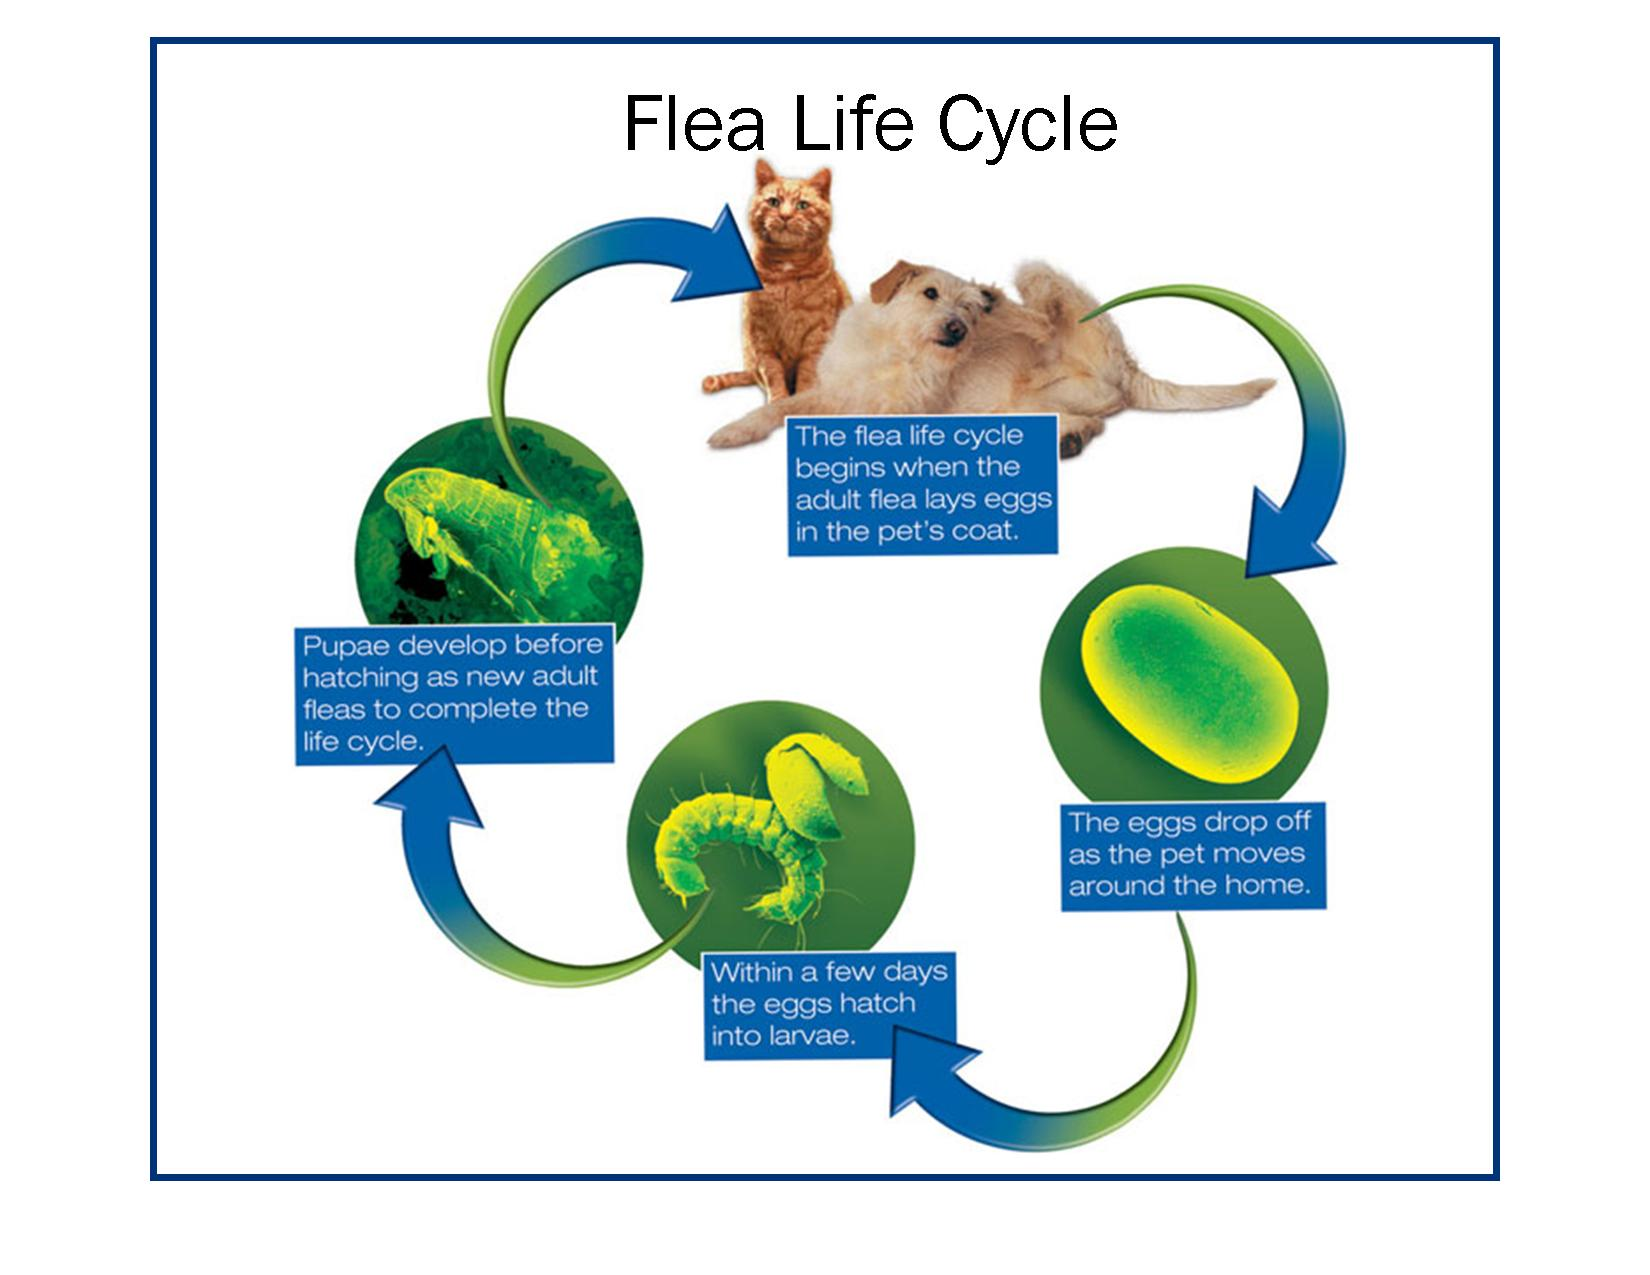 flea-life-cycle